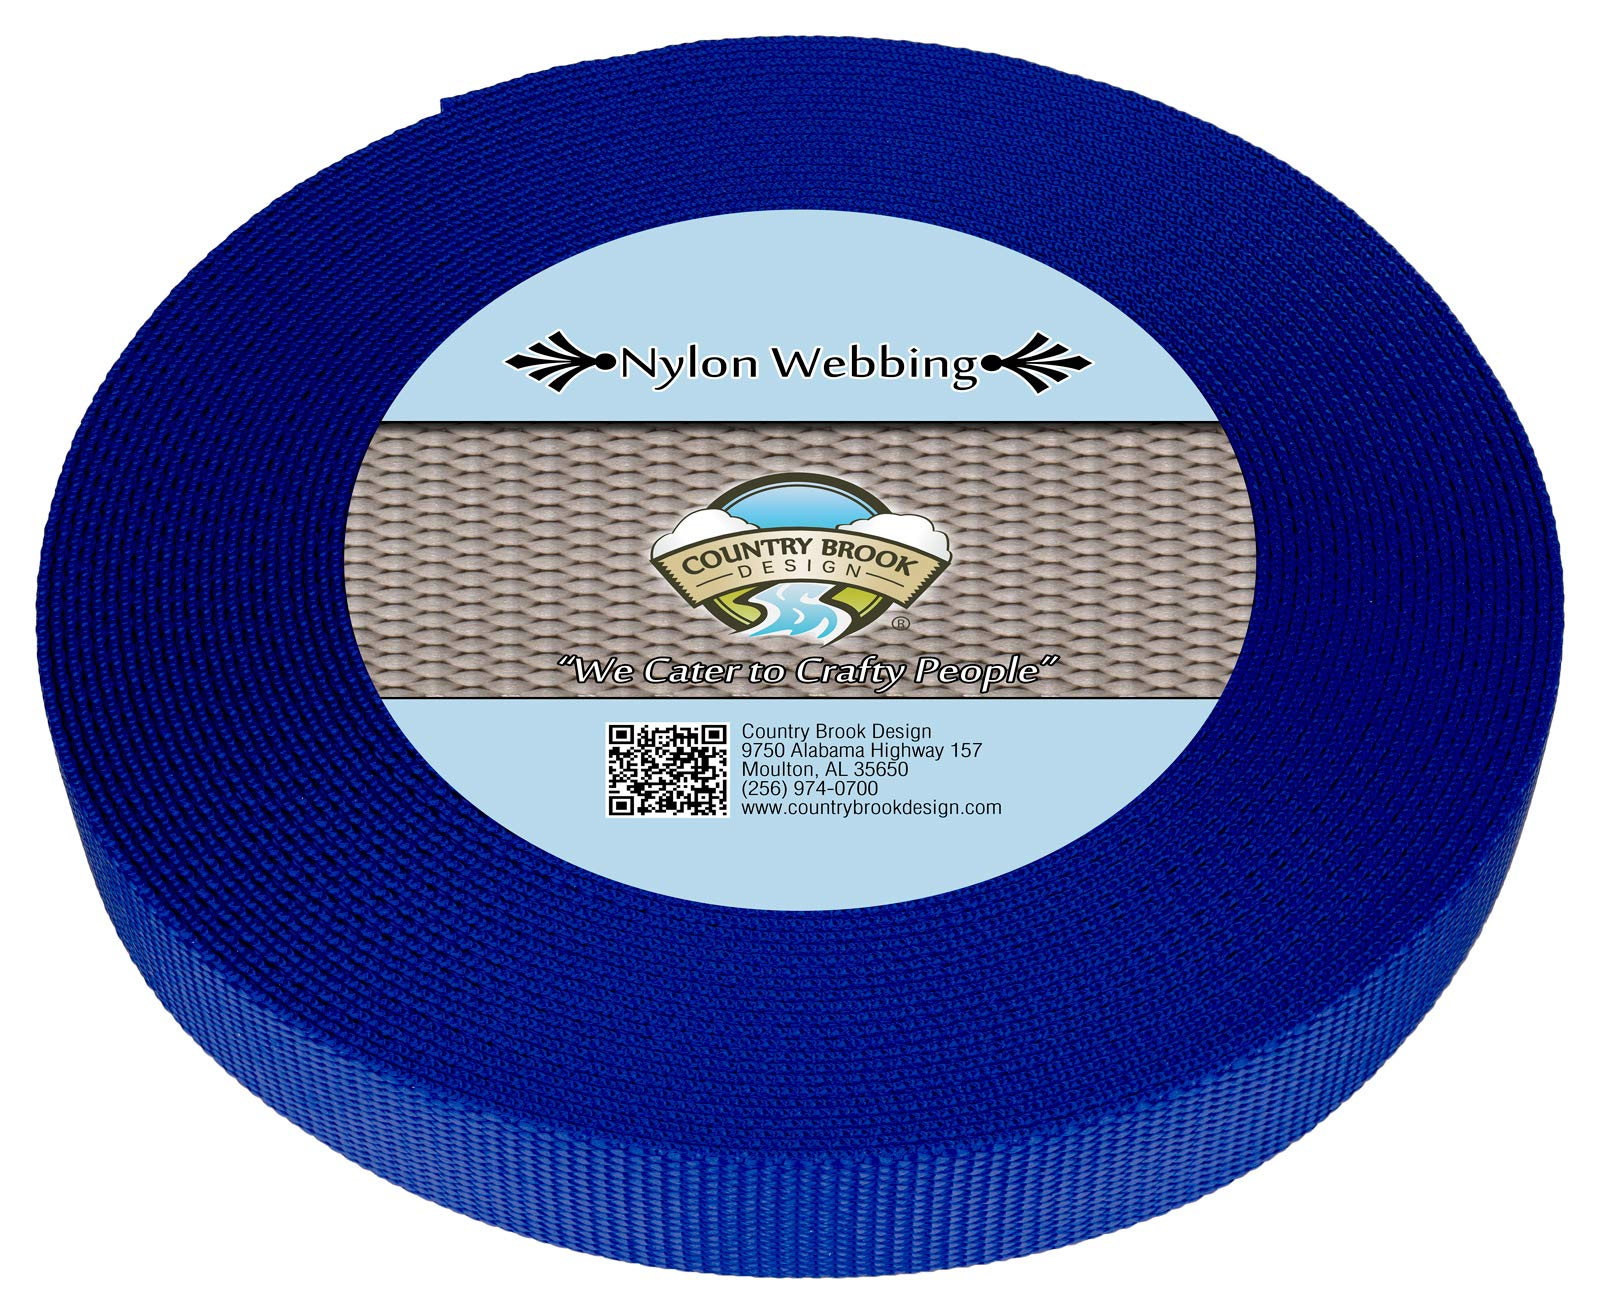 Country Brook Design   Bright Royal Blue 1 Inch Heavy Nylon Webbing (10 Yards)